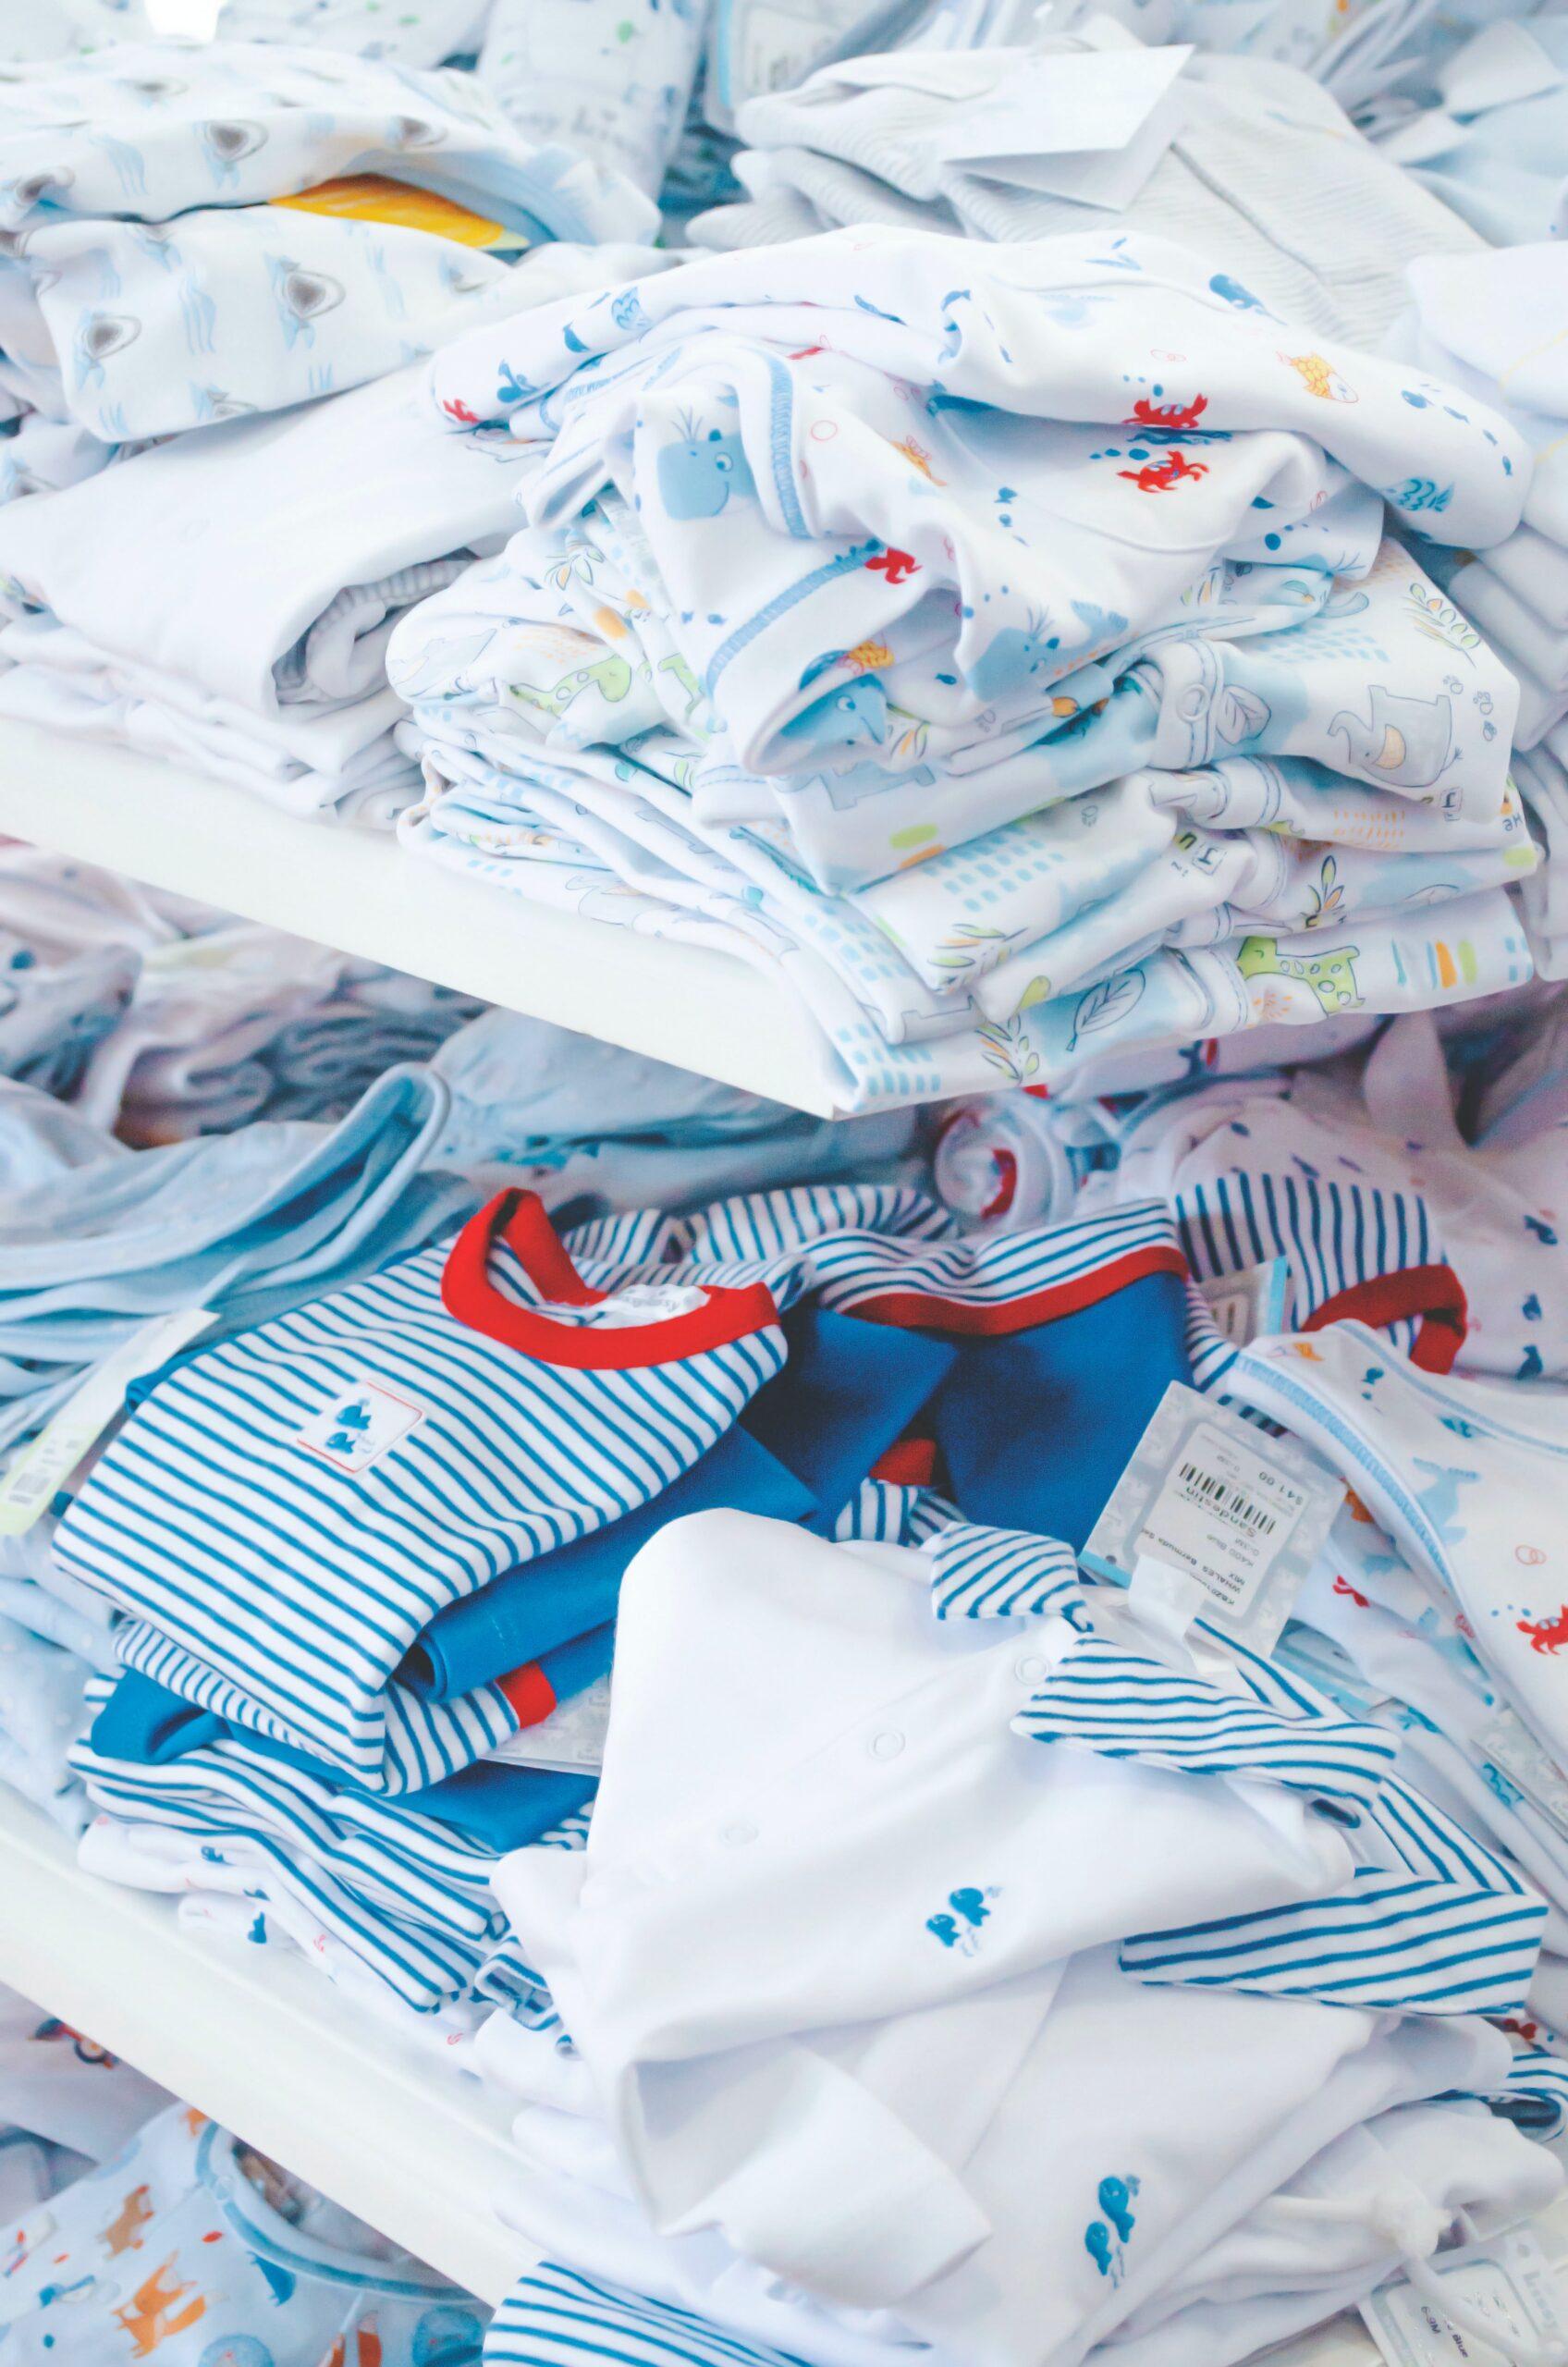 Top branduri de haine pentru bebeluși